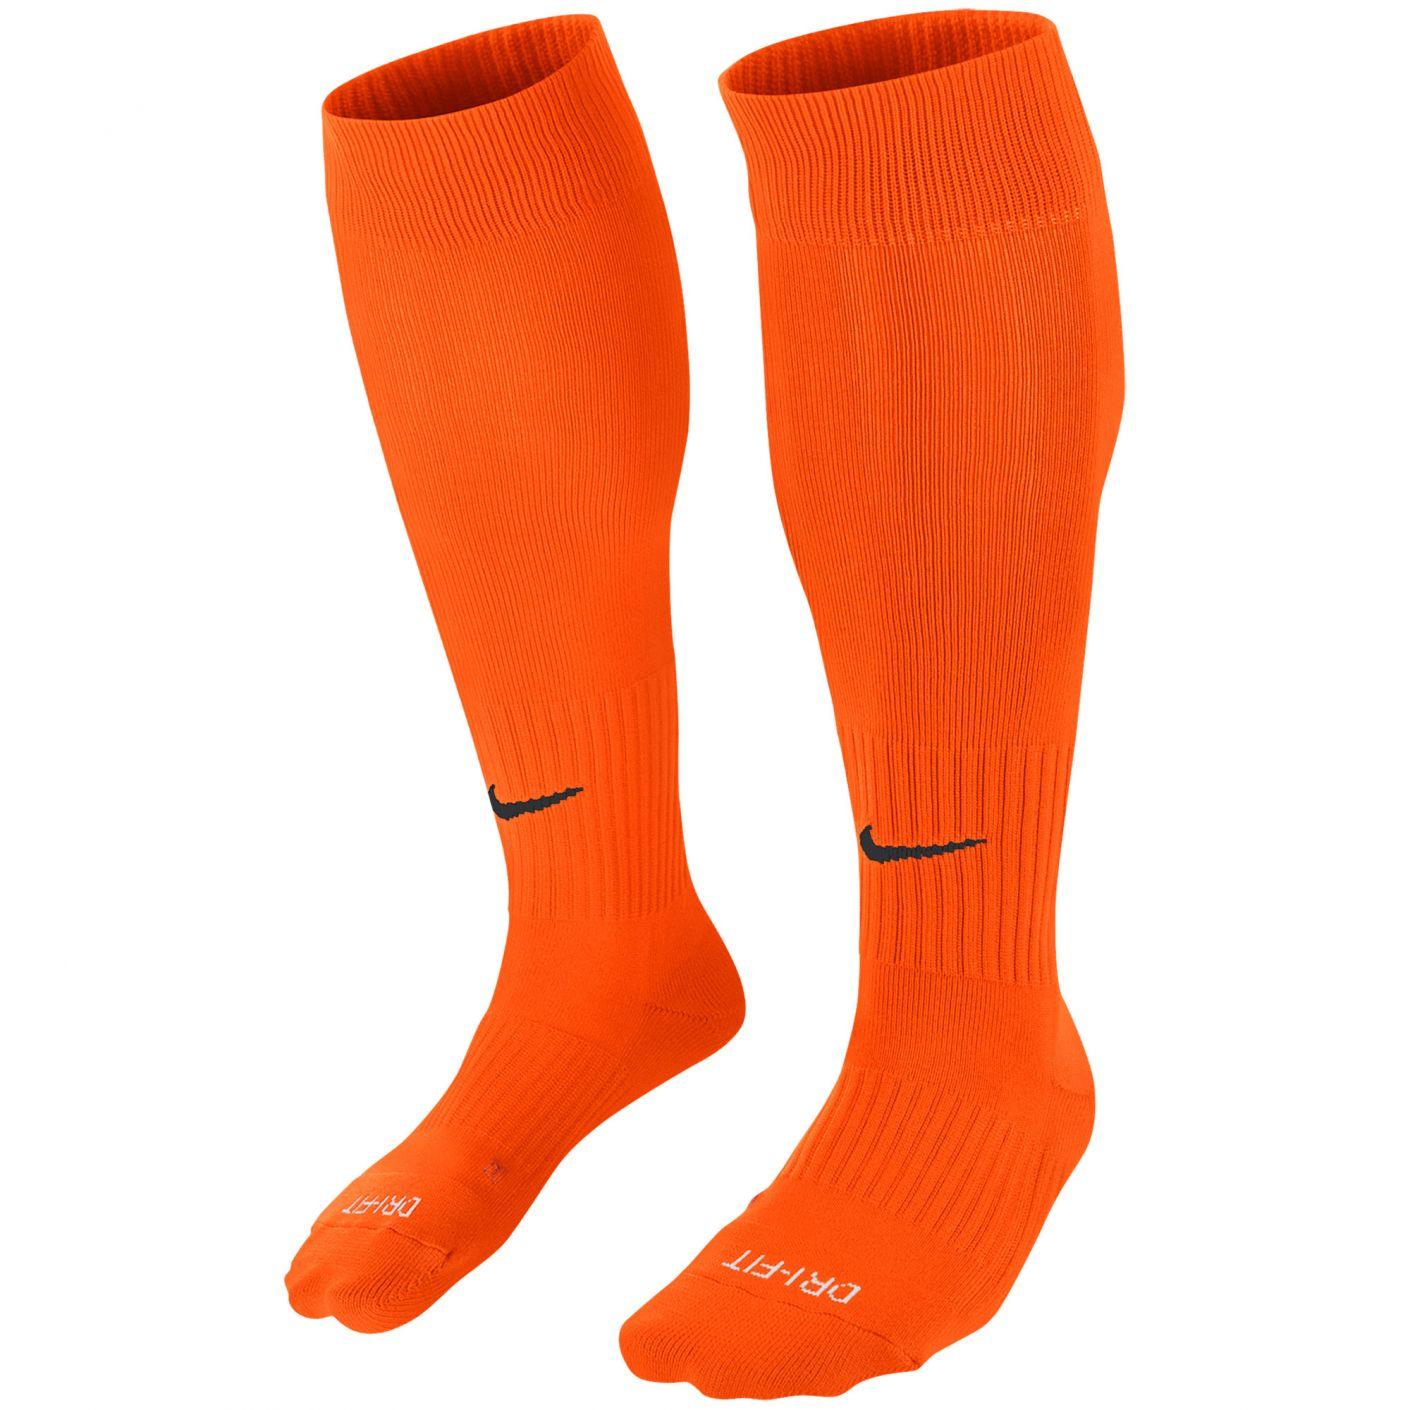 Football Factory Keeperskousen Oranje